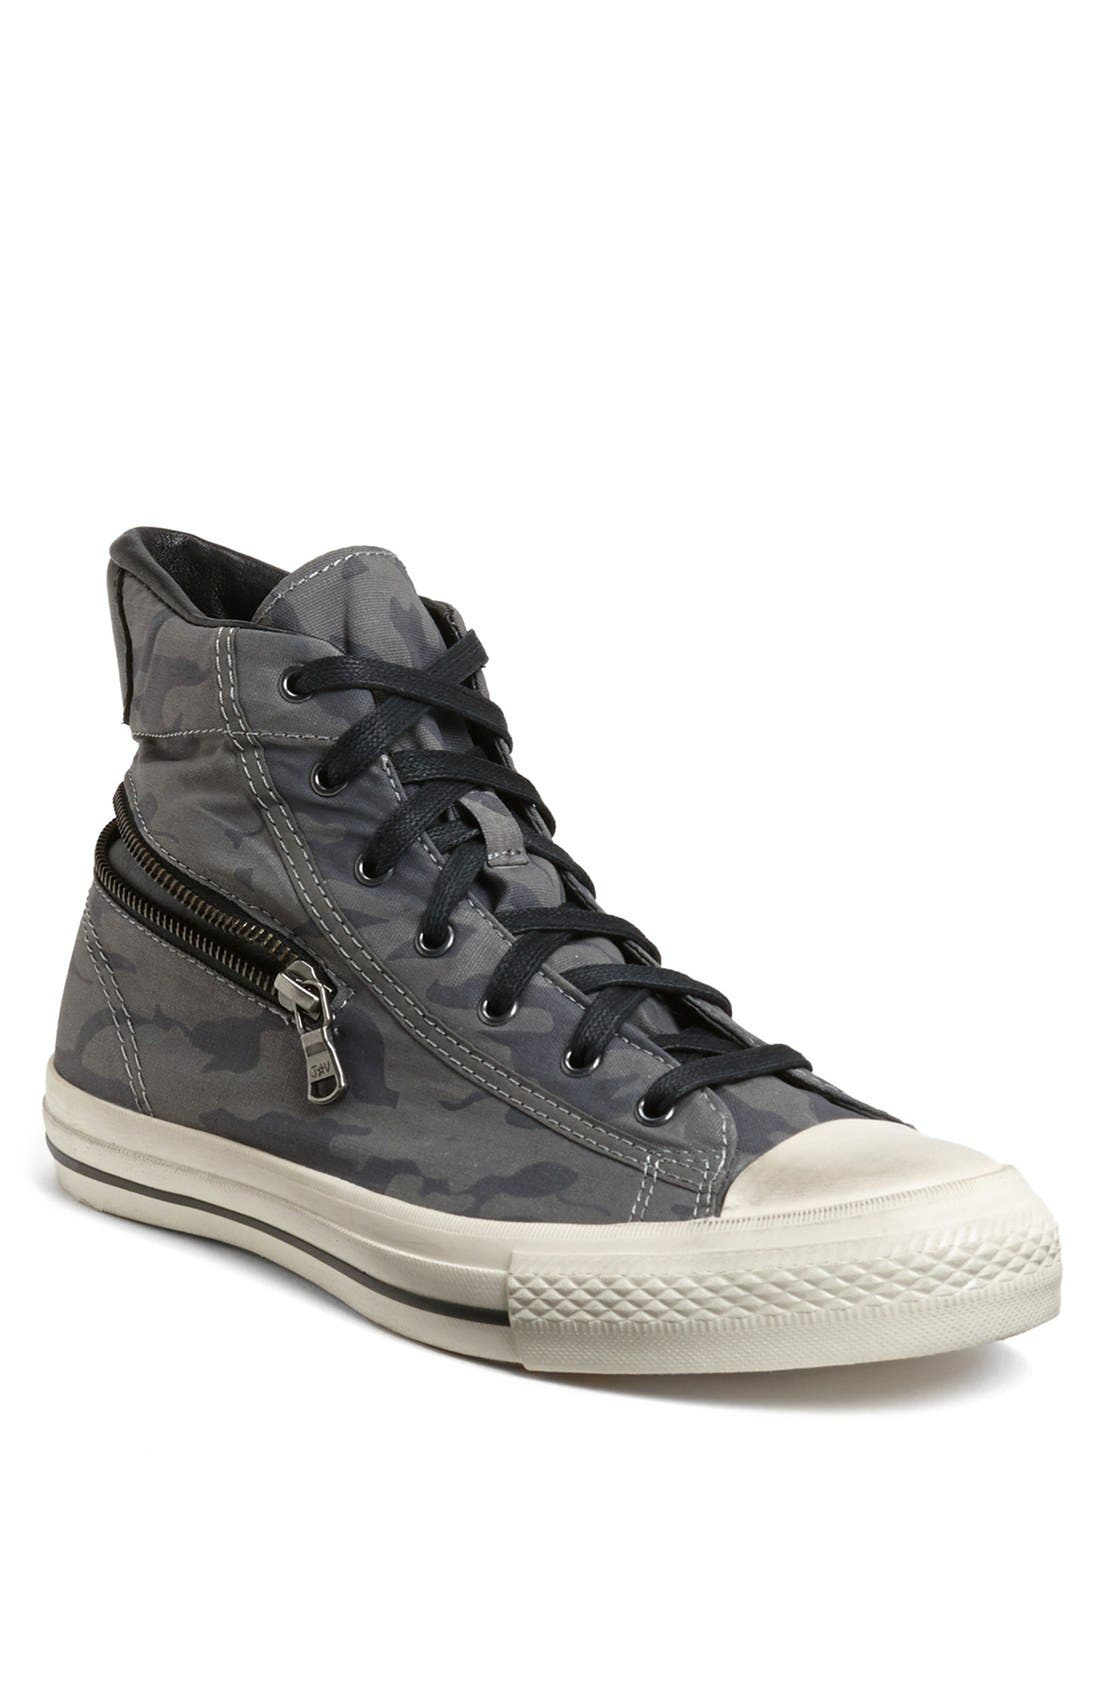 Alternate Image 1 Selected - Converse by John Varvatos Chuck Taylor® Zip Sneaker